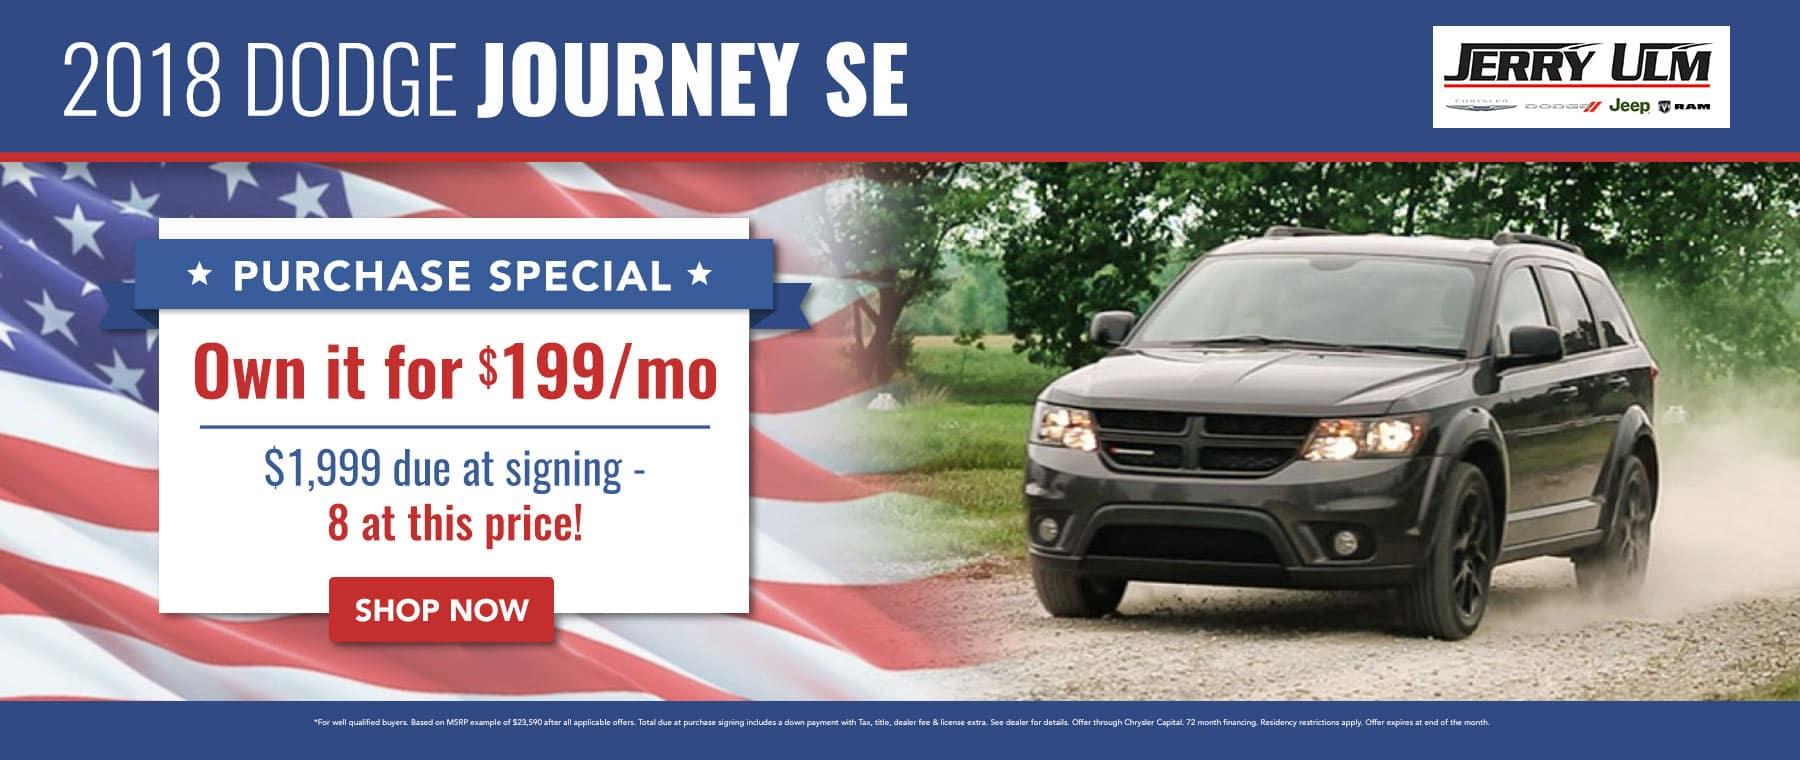 2018 Dodge Journey special